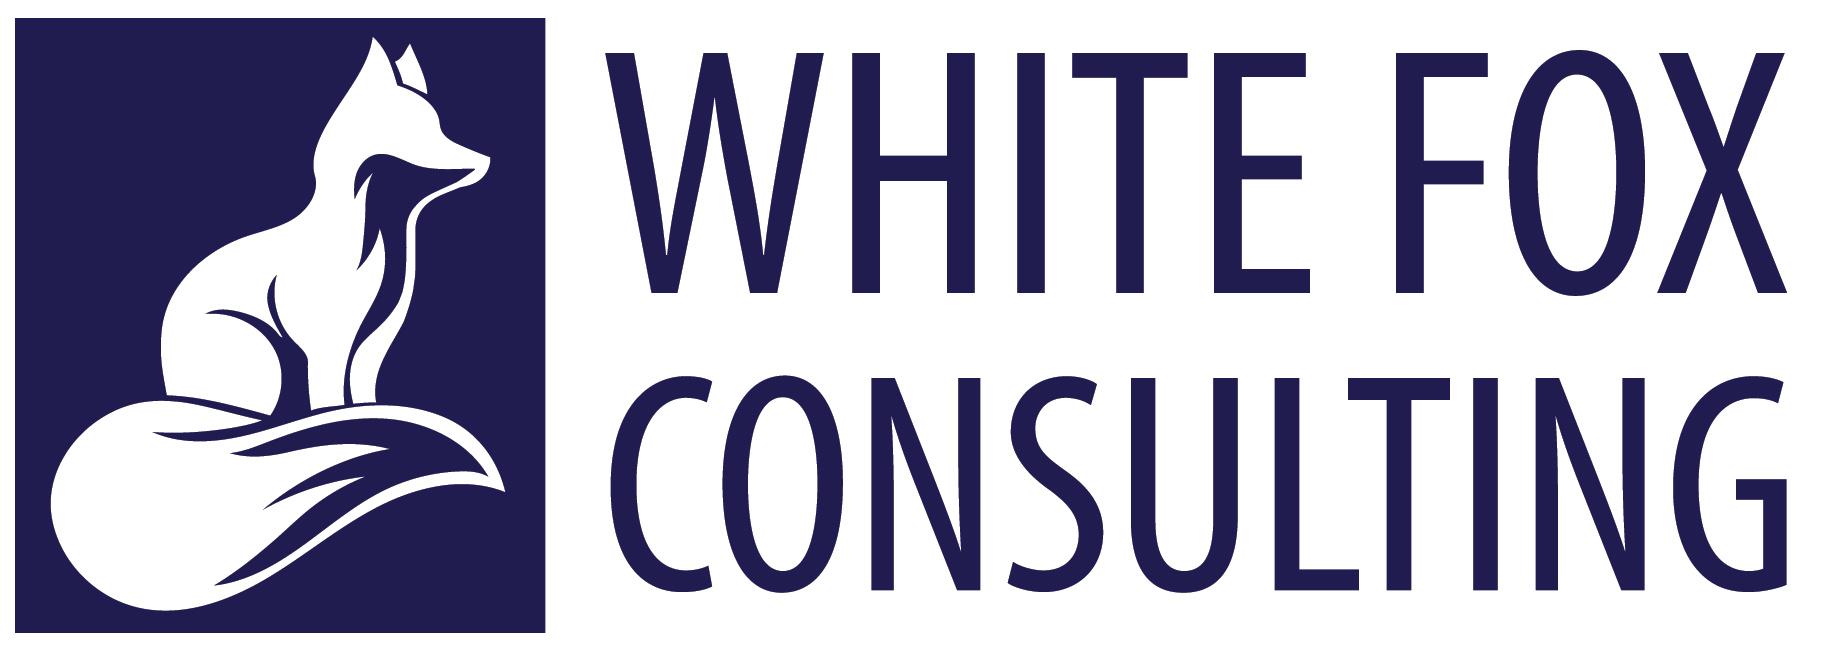 whitefox_logo_final_vector_web.jpg